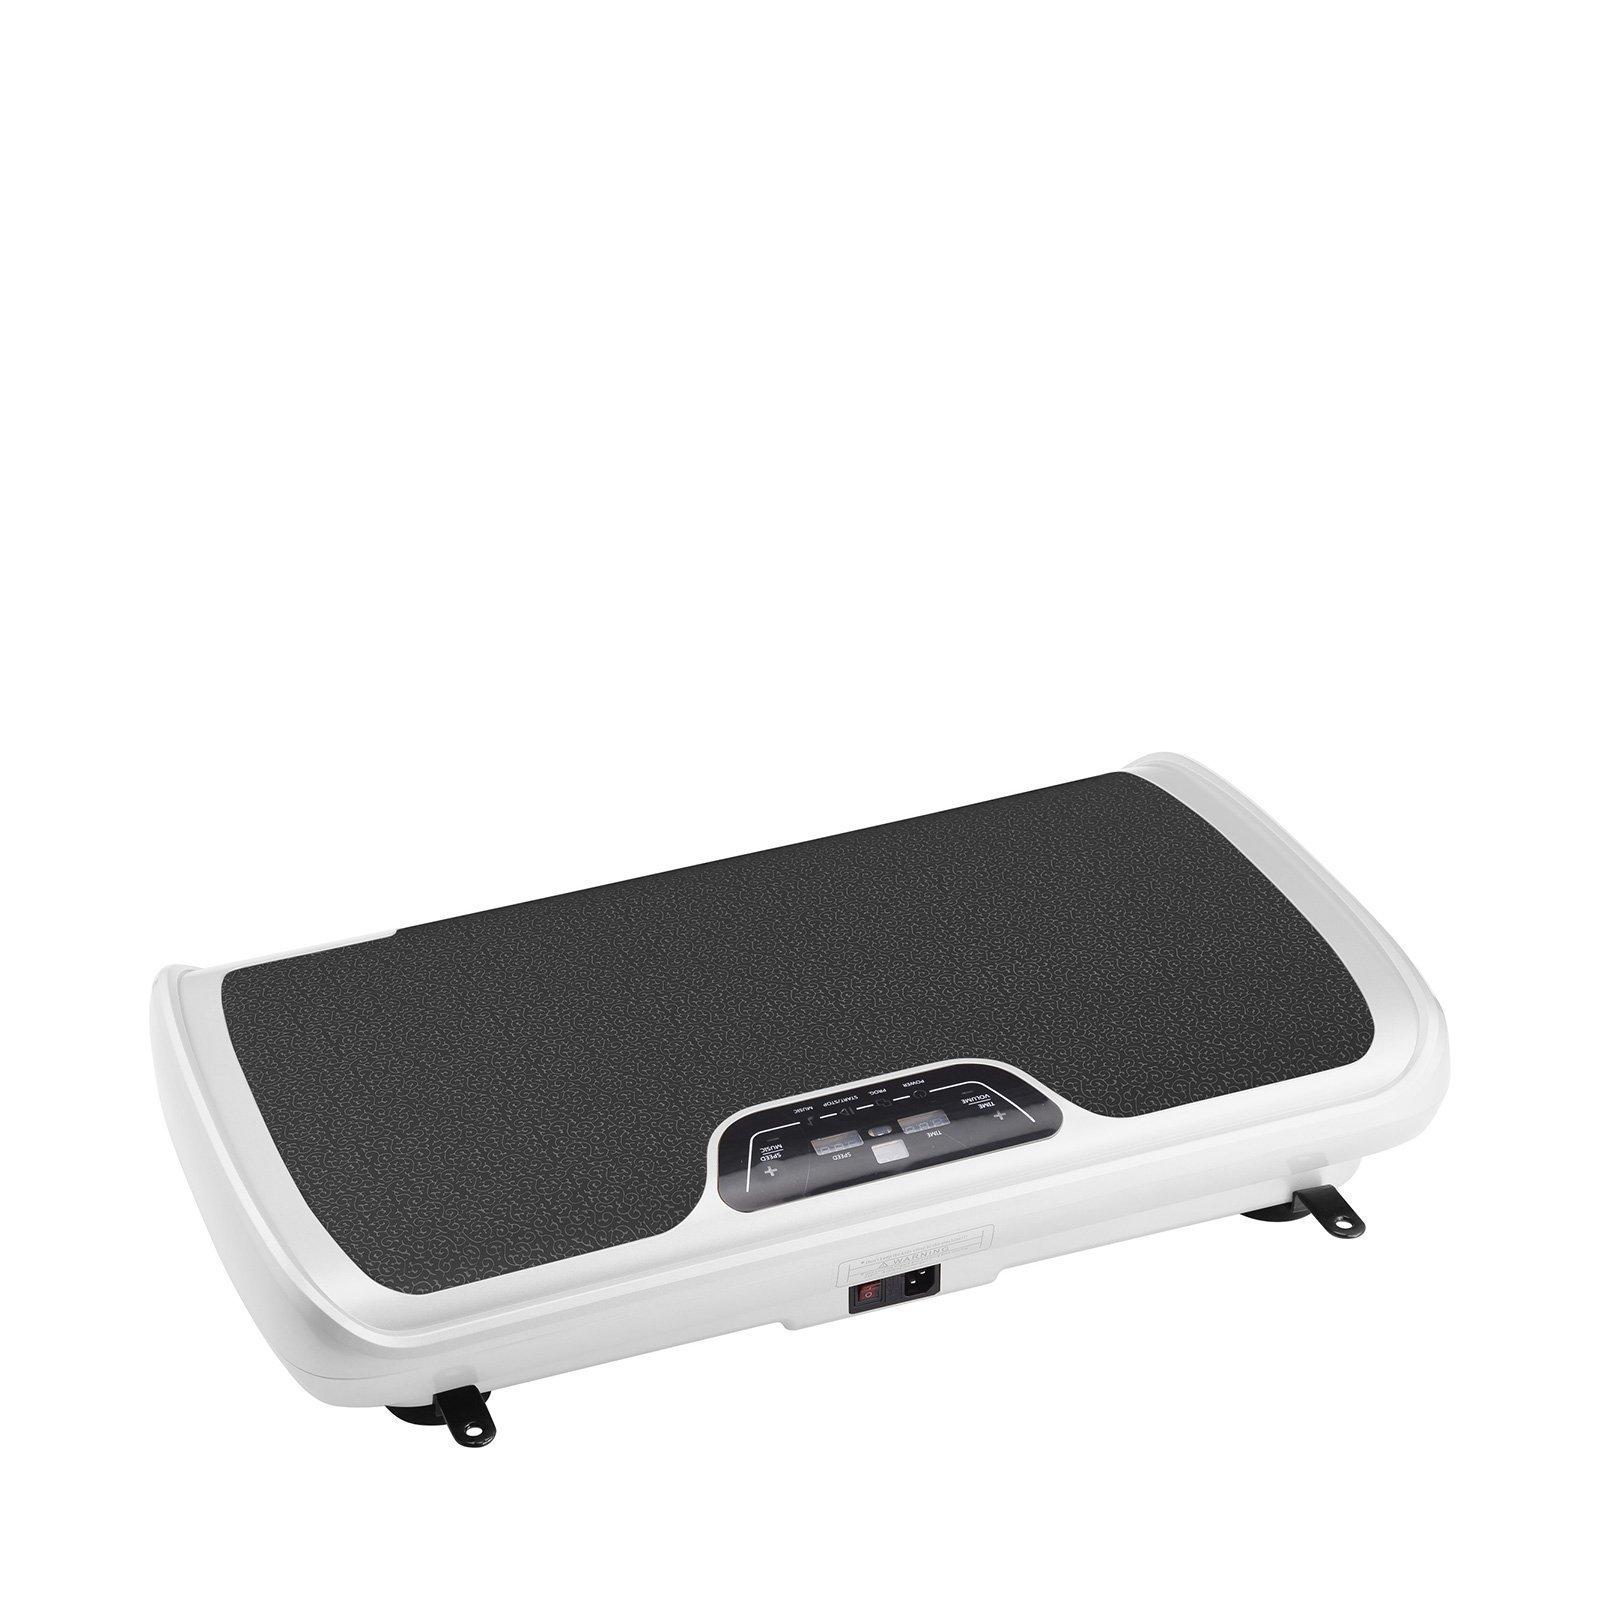 VibroSlim Tone Vibration Platform Fitness Machine, Oscillating Vibration Trainer + Free Workout DVD, Wall Chart & Resistance Bands (White) by VibroSlim (Image #3)